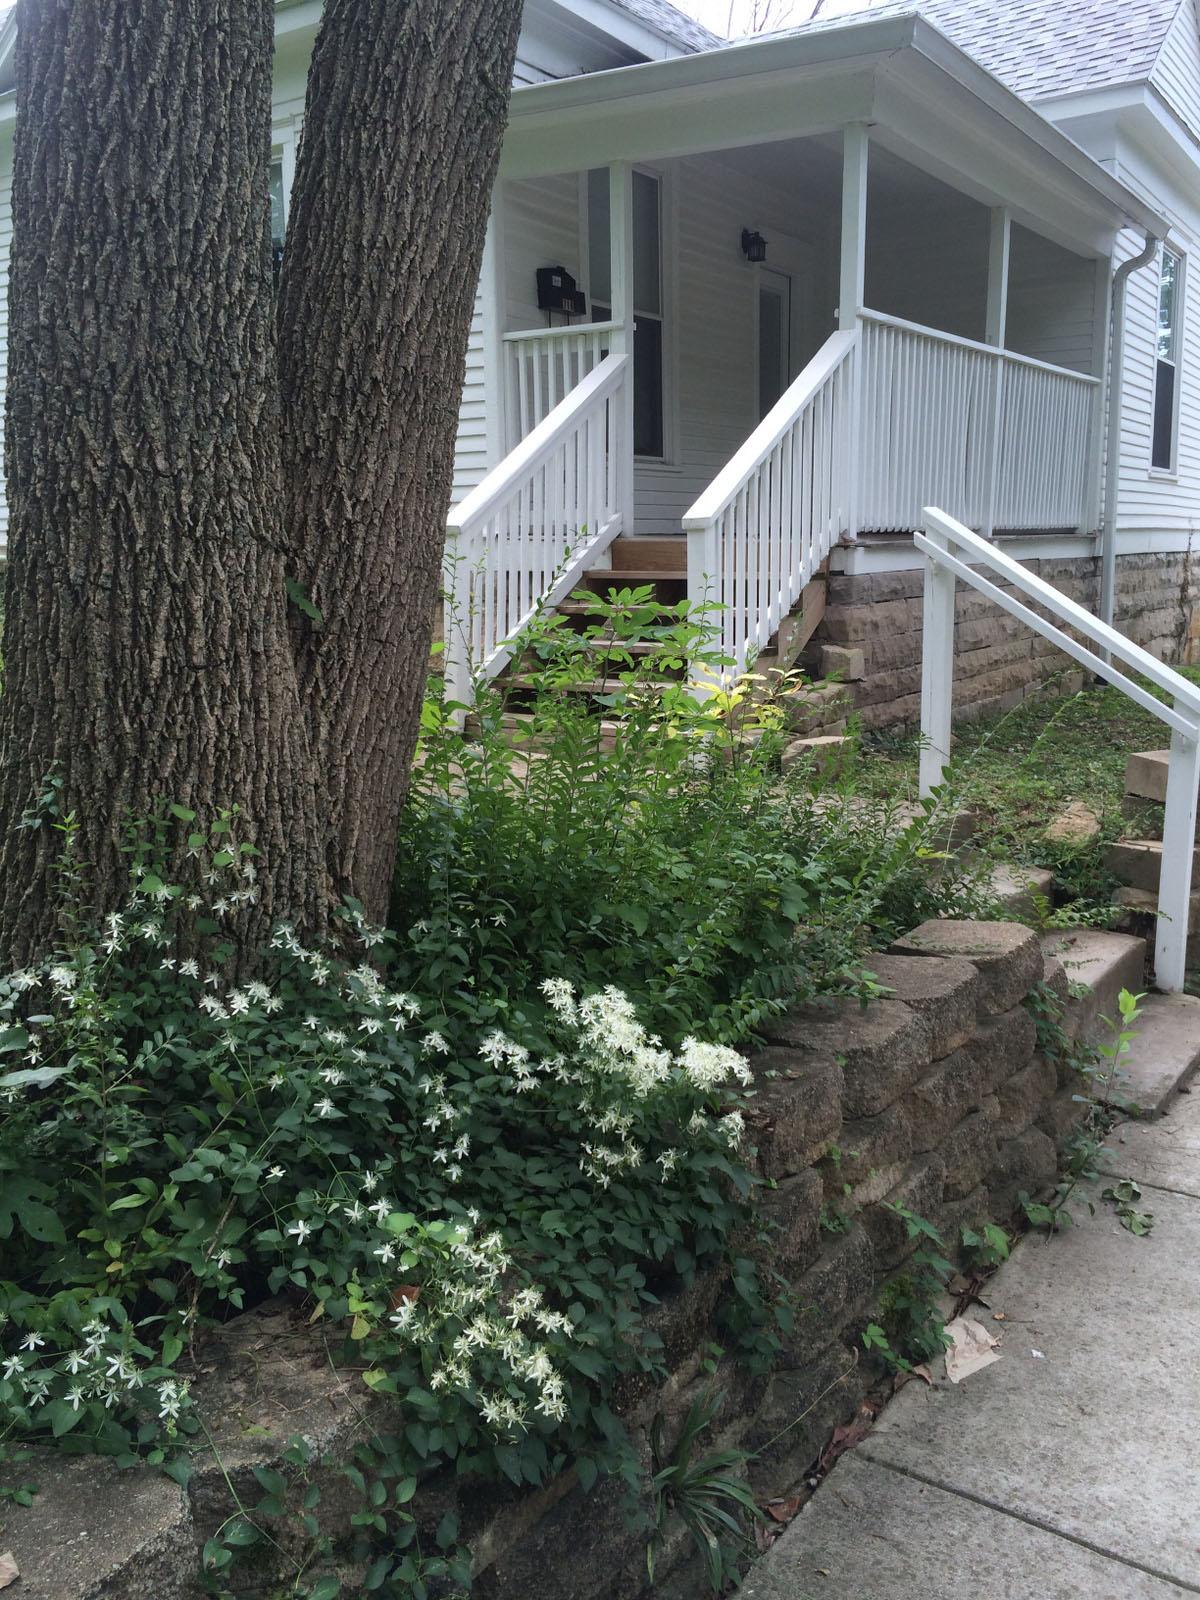 sabbatical-home-in-bloomington-Indiana